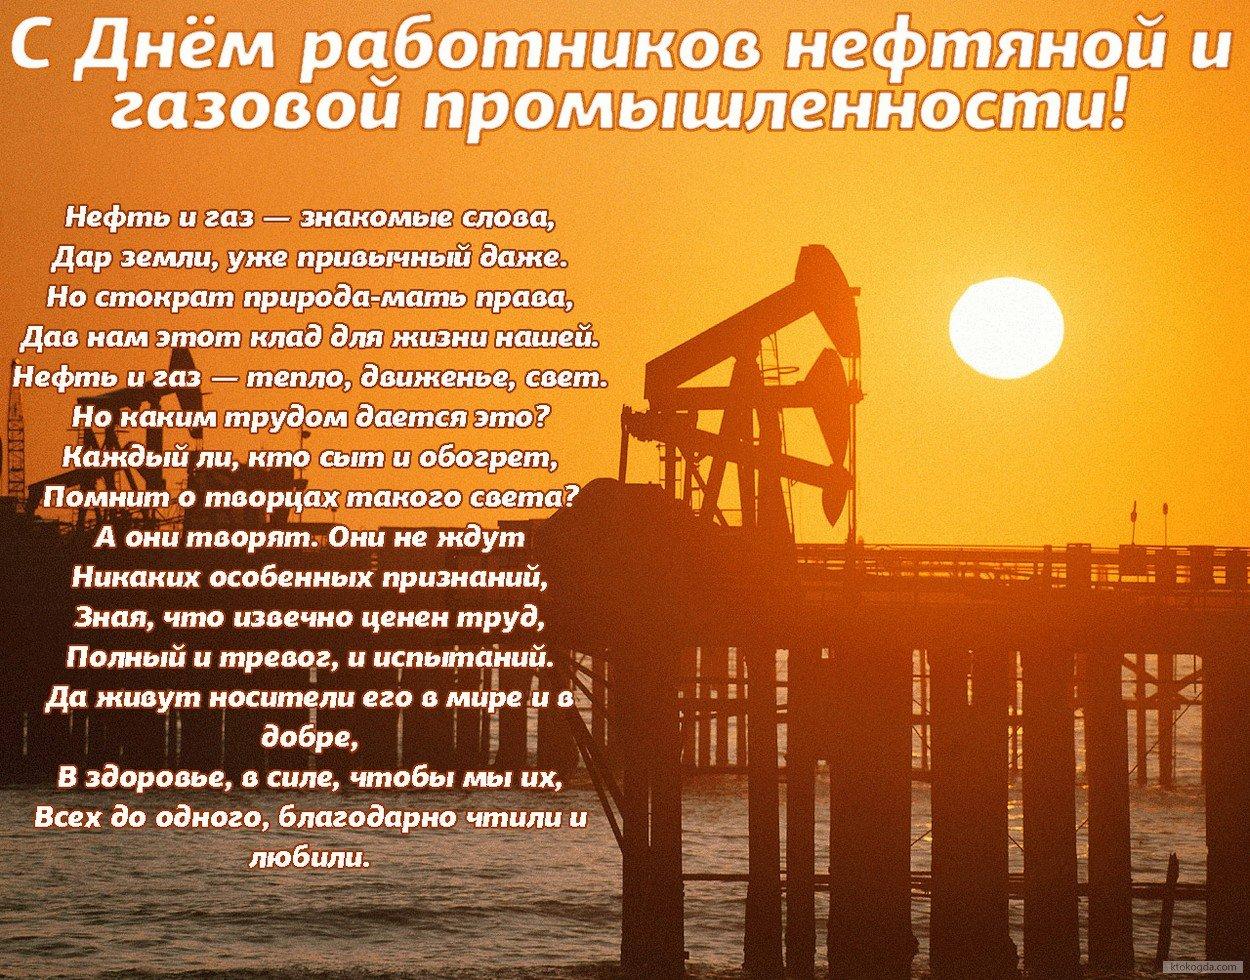 Картинки к дню нефтяника